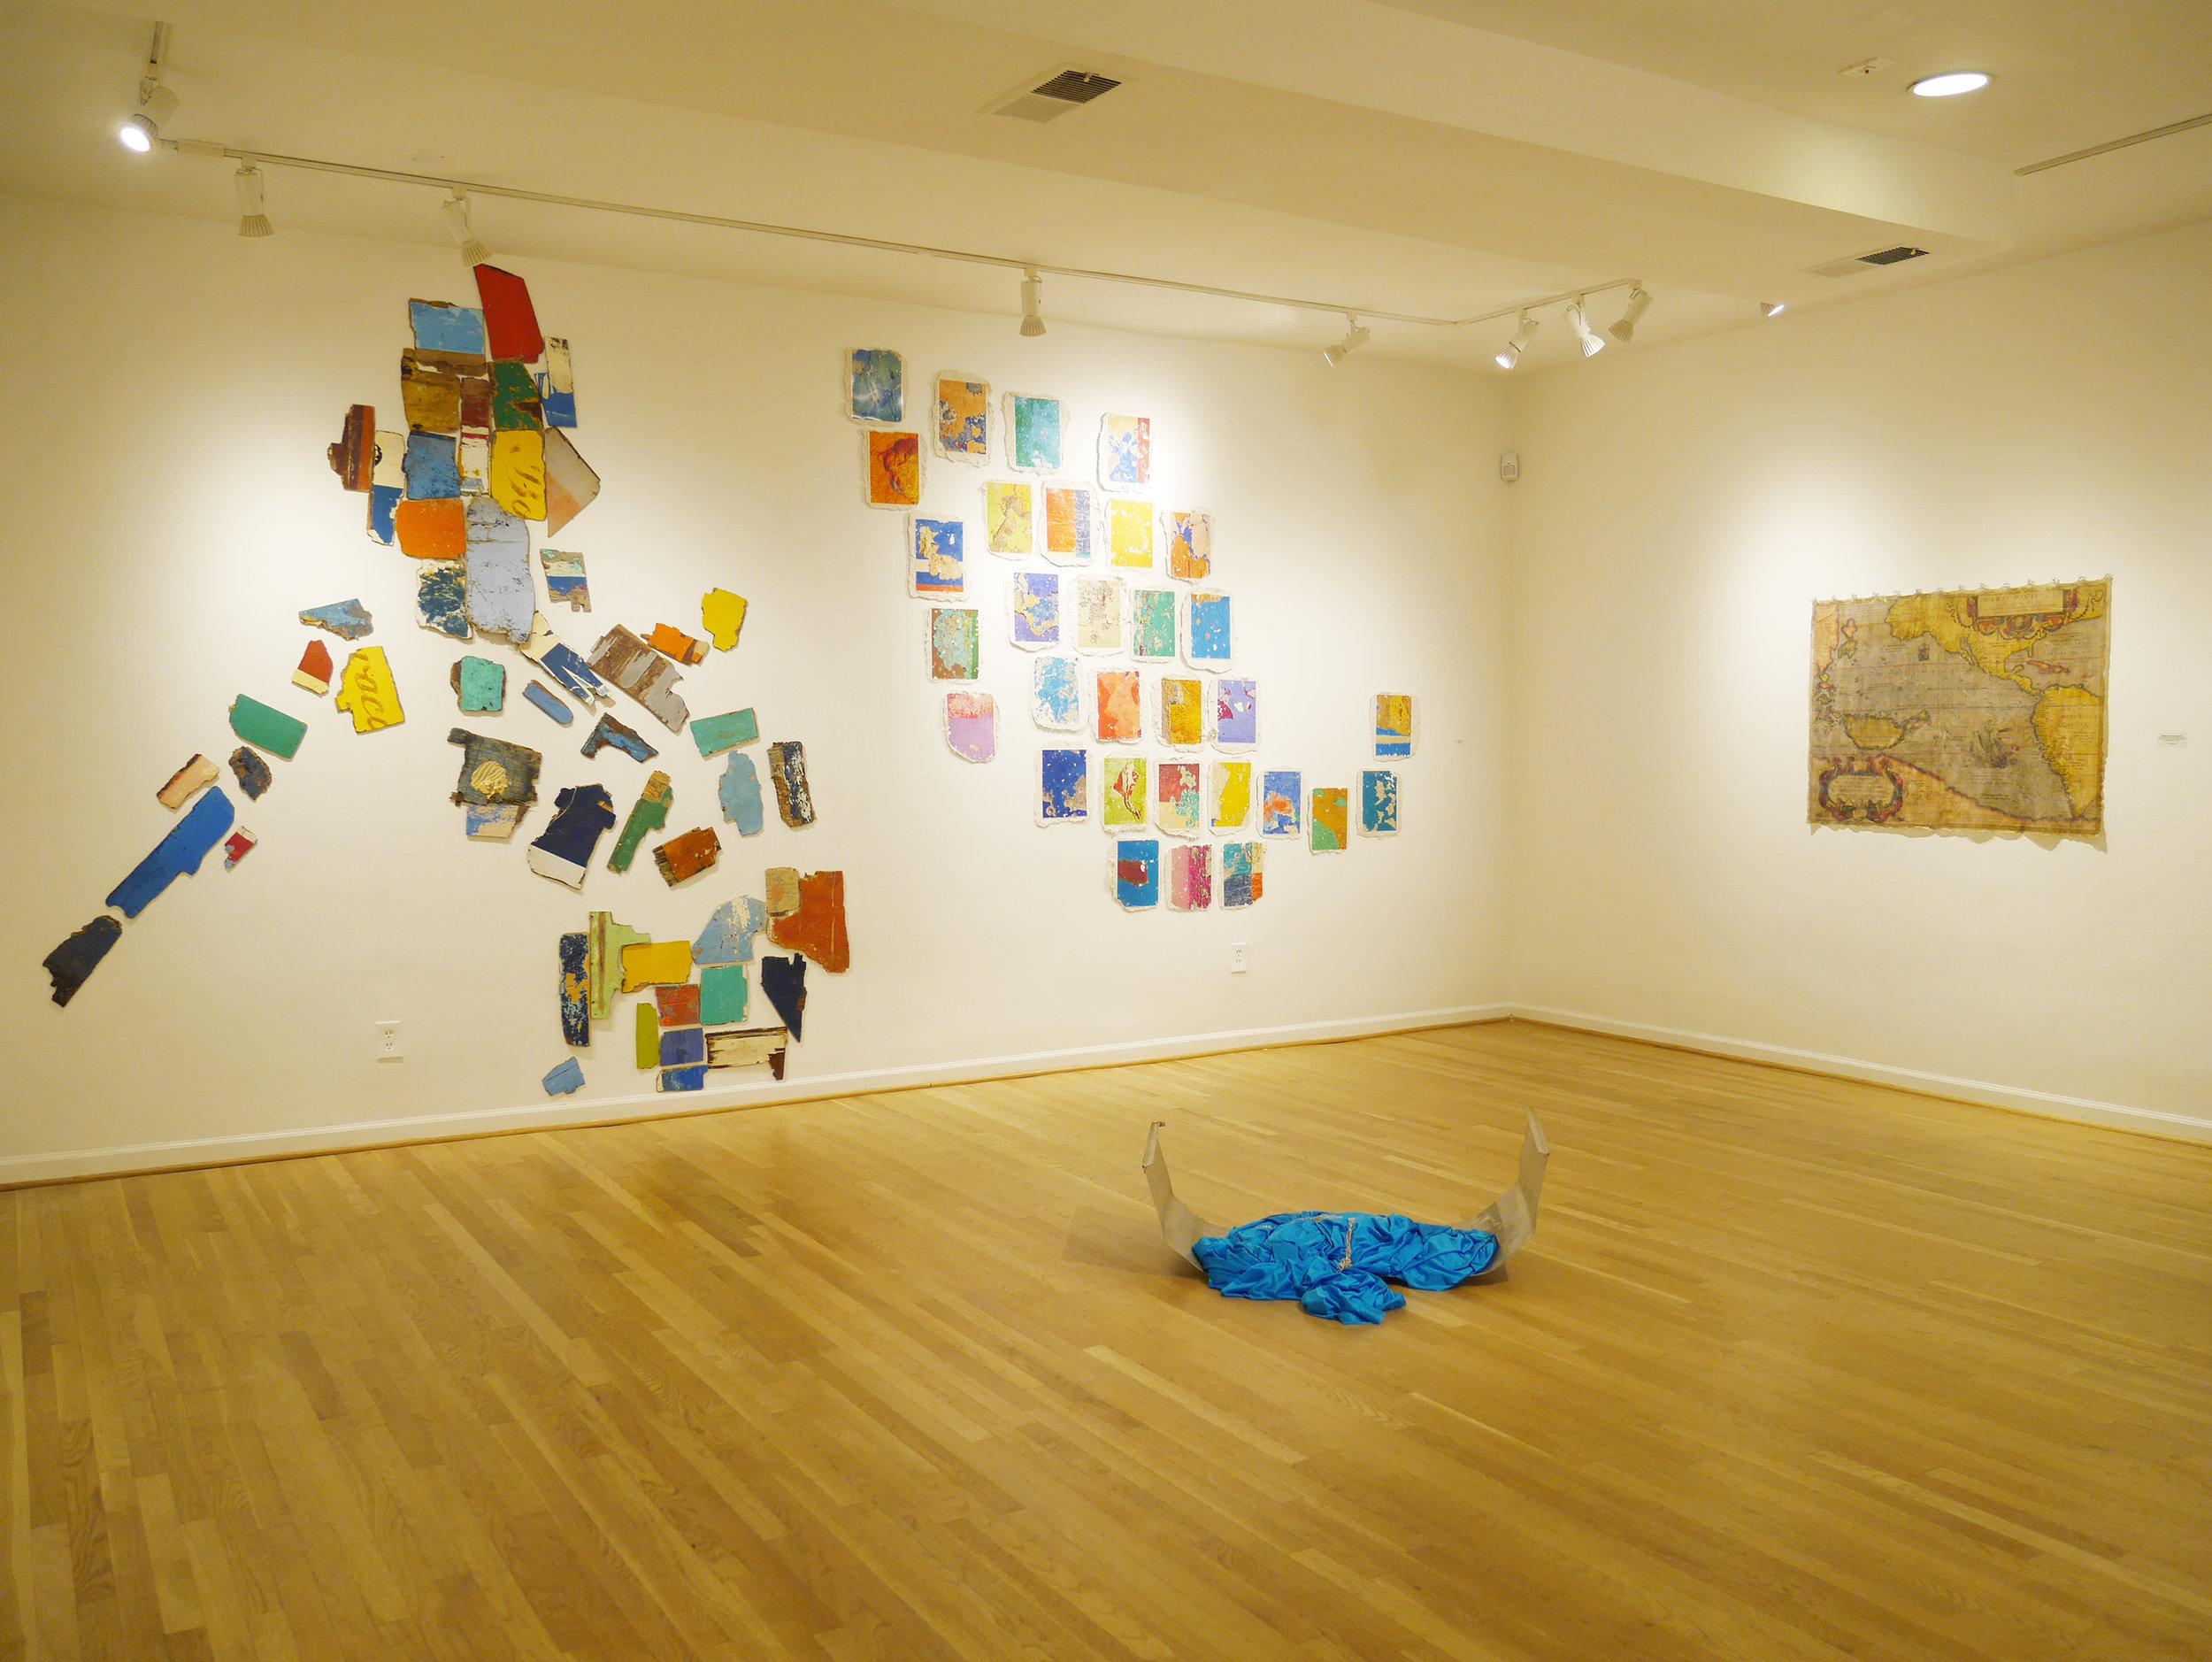 installation view: Fragments, 2017